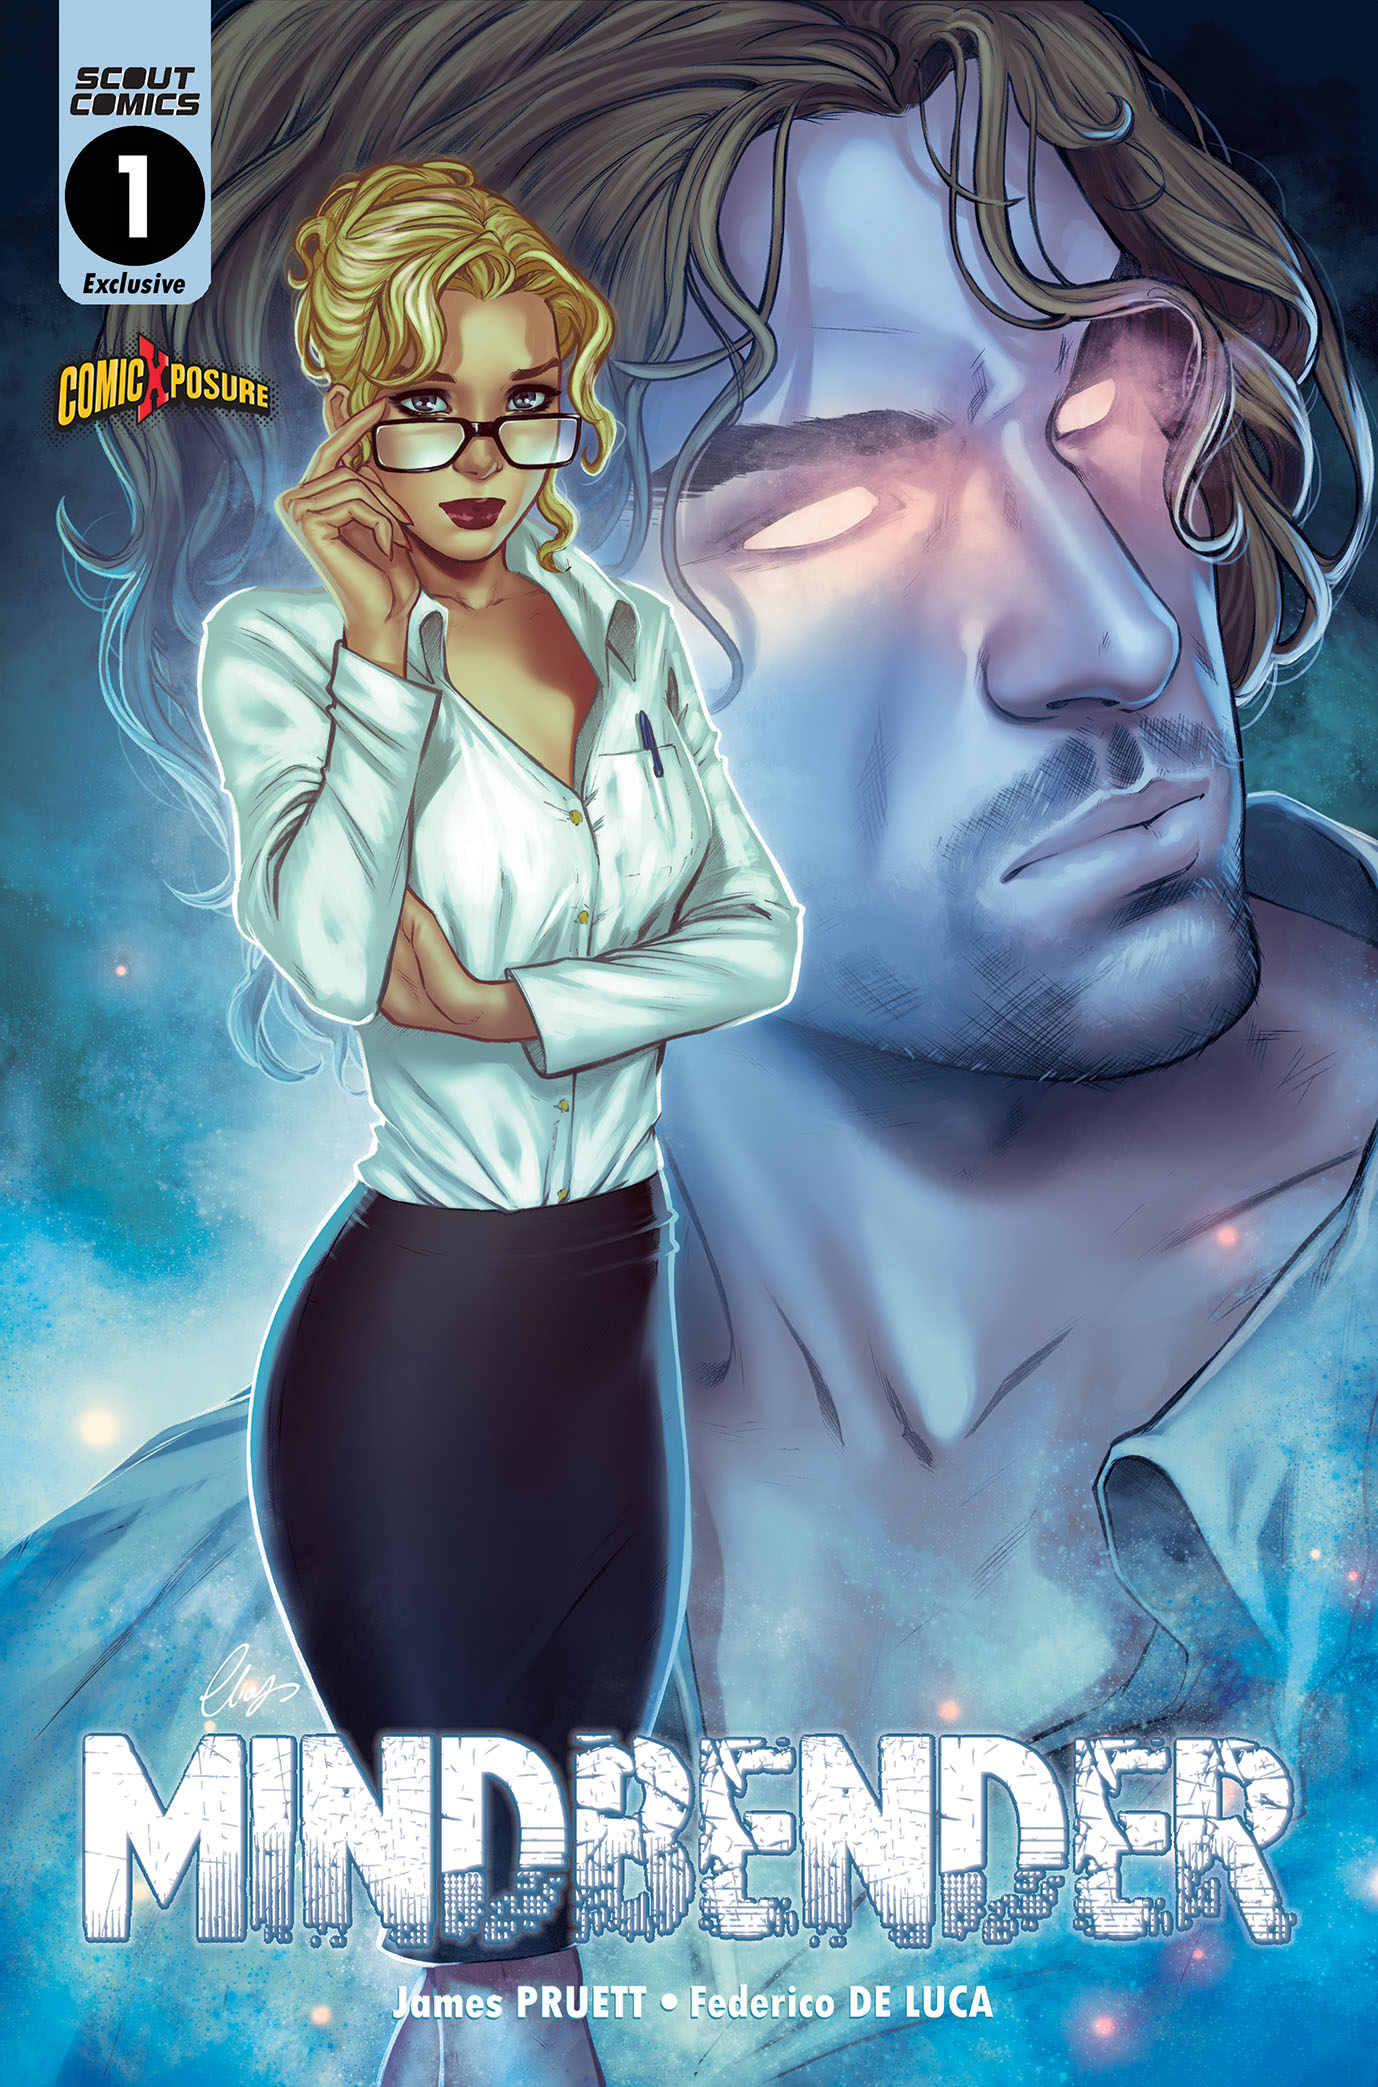 Scout Comics 2017 Long Lost #2 1st print